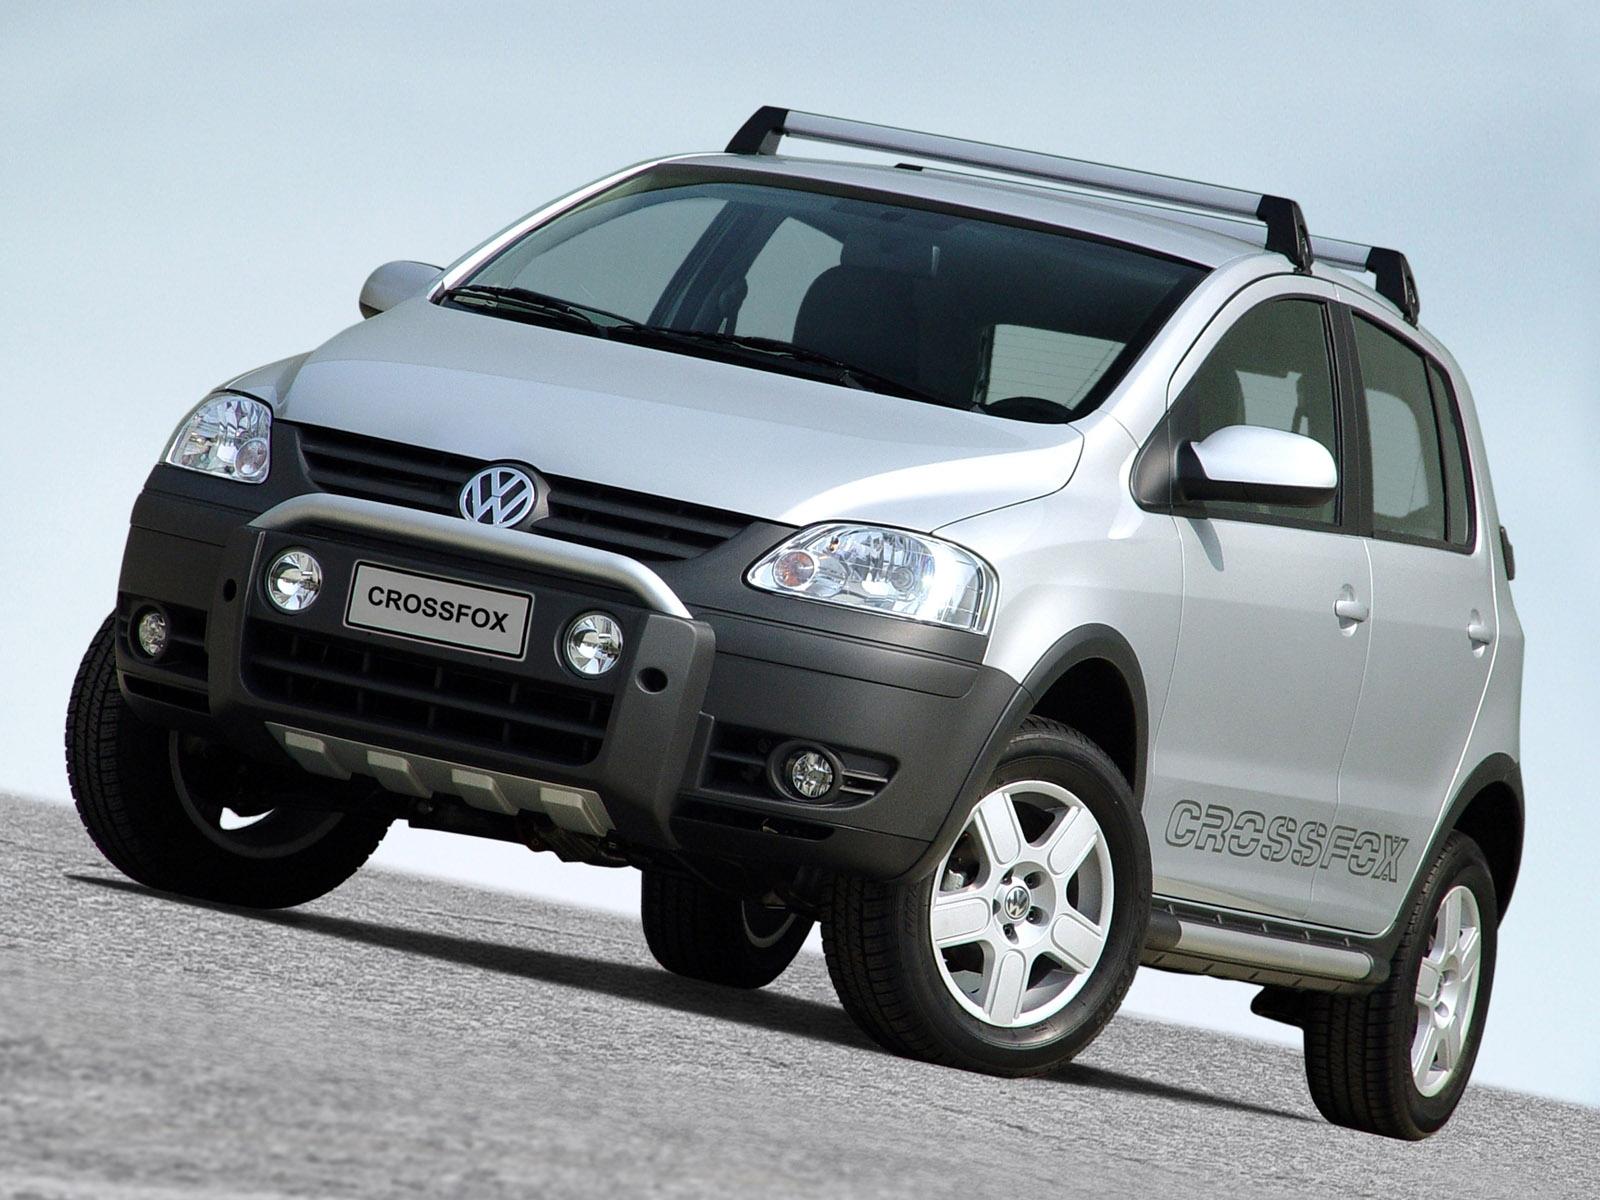 Volkswagen Crossfox Photos Photogallery With 6 Pics